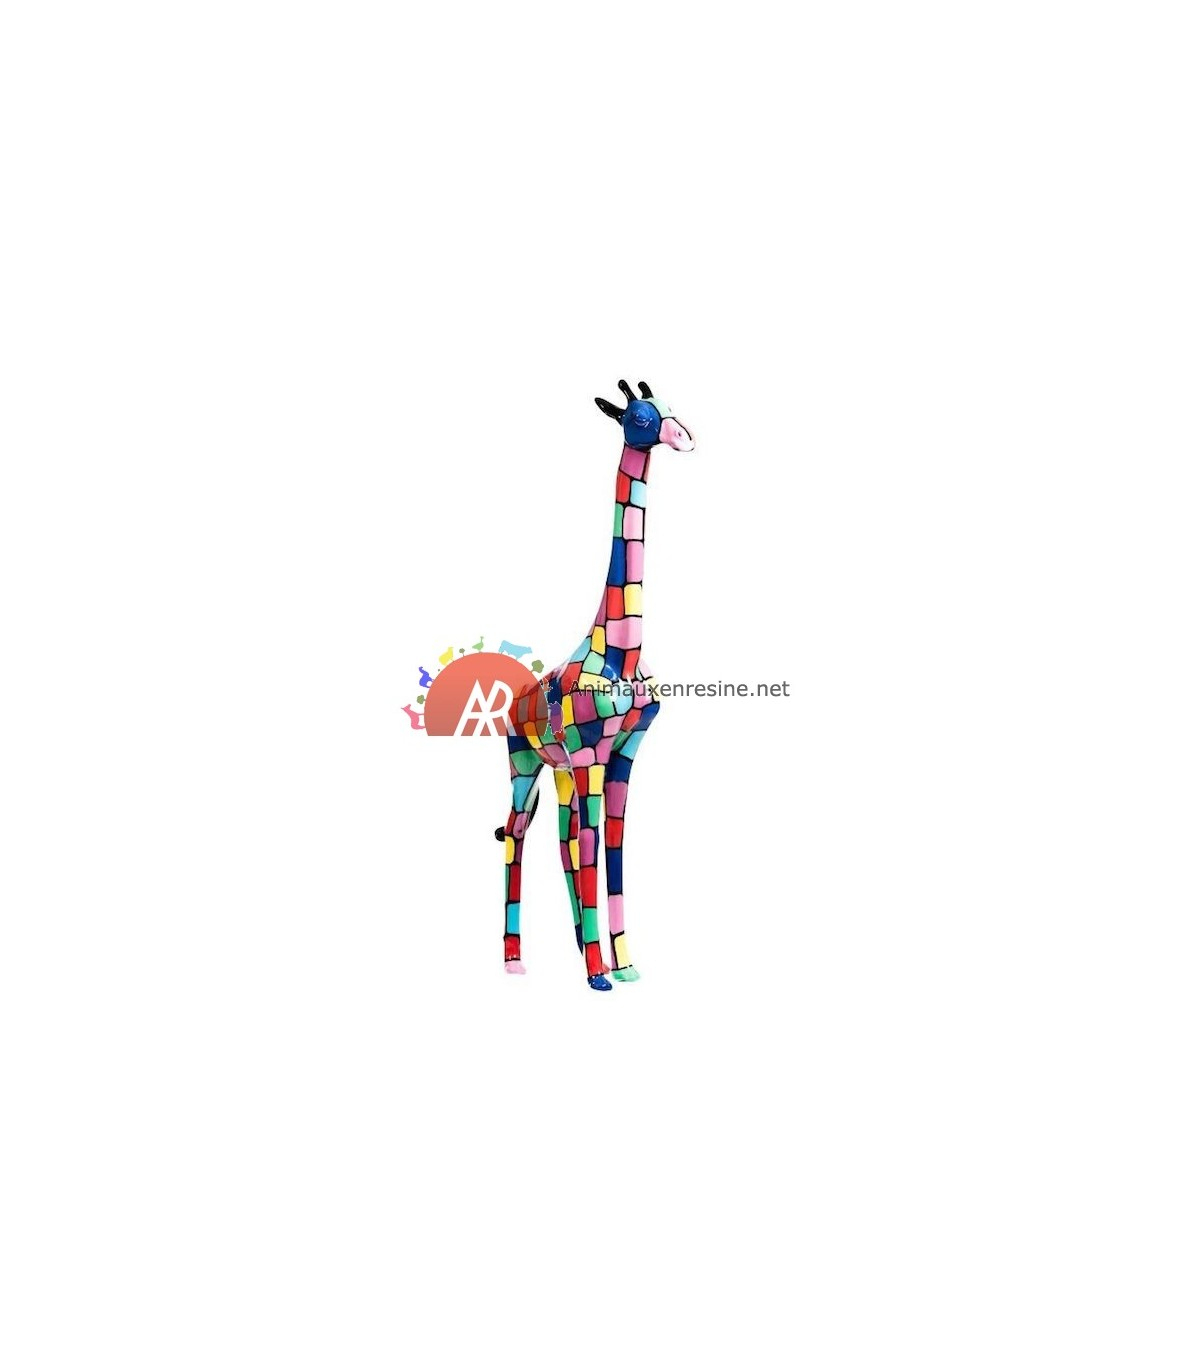 Girafe Resine Deco Moyen Modèle Smarties 205Cm avec Nain De Jardin Fuck